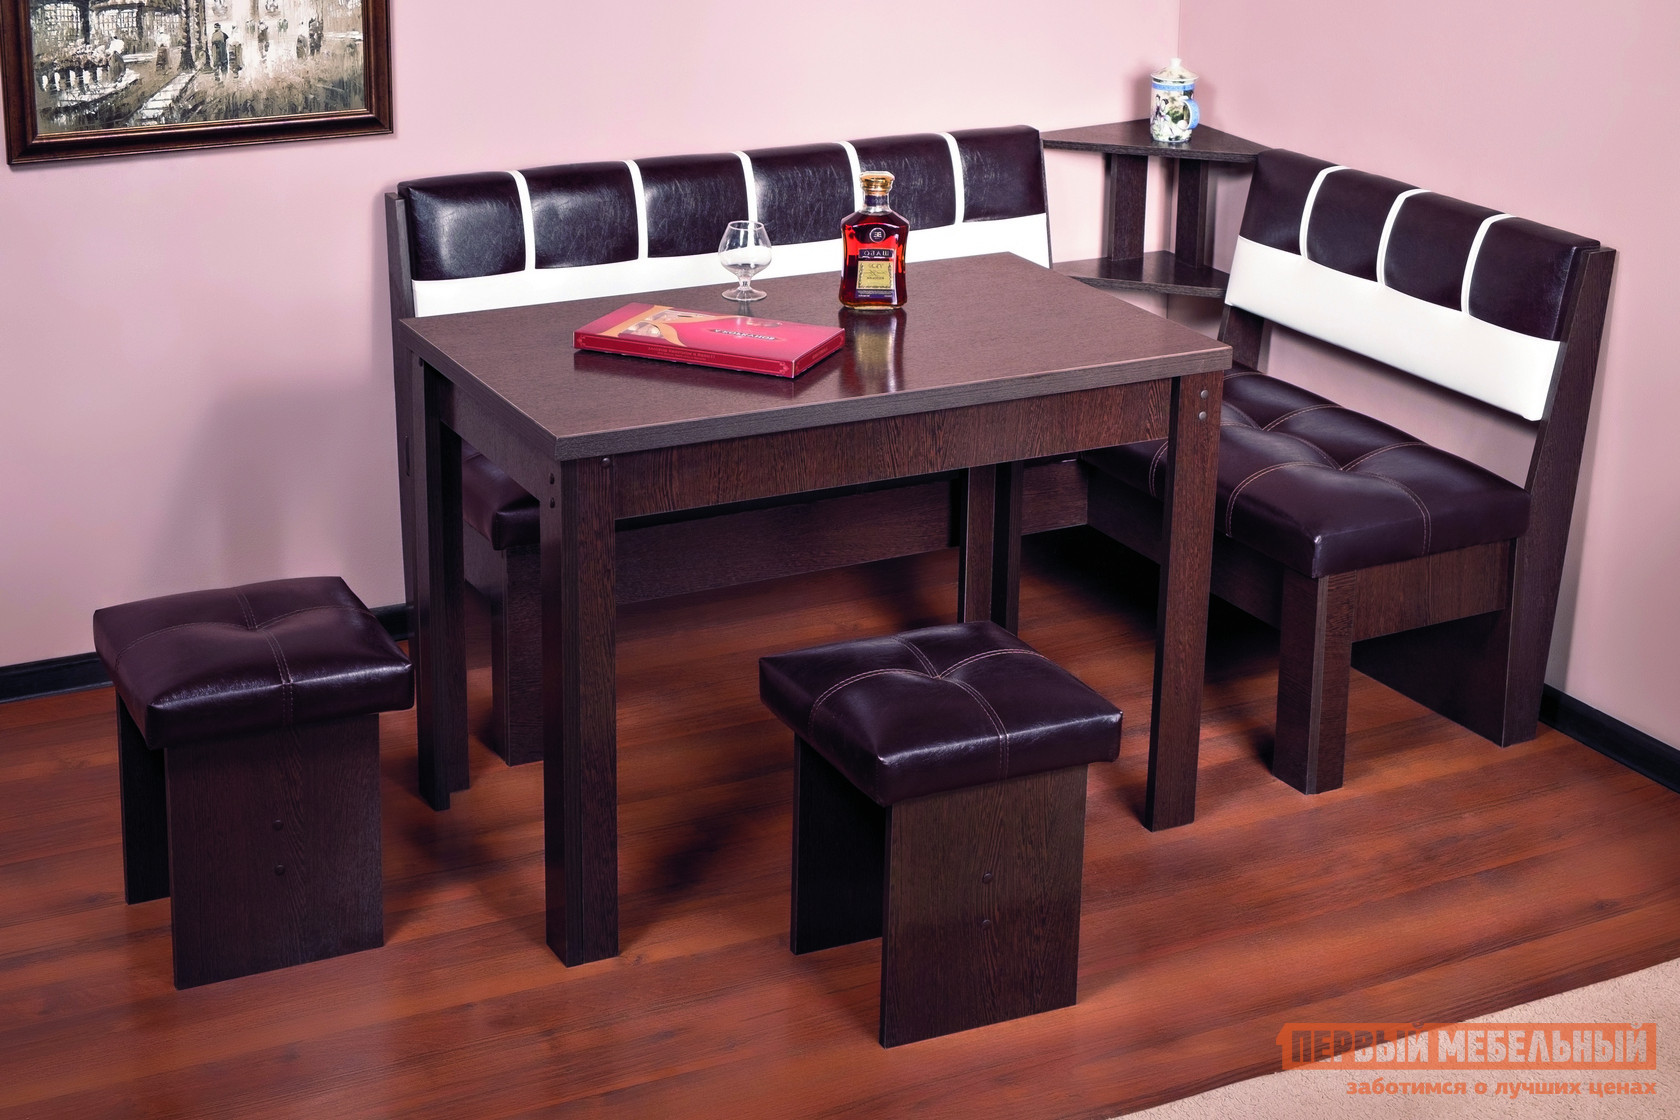 Кухонный уголок Первый Мебельный Кухонный уголок Октава люкс 2 модульный кухонный уголок блюз